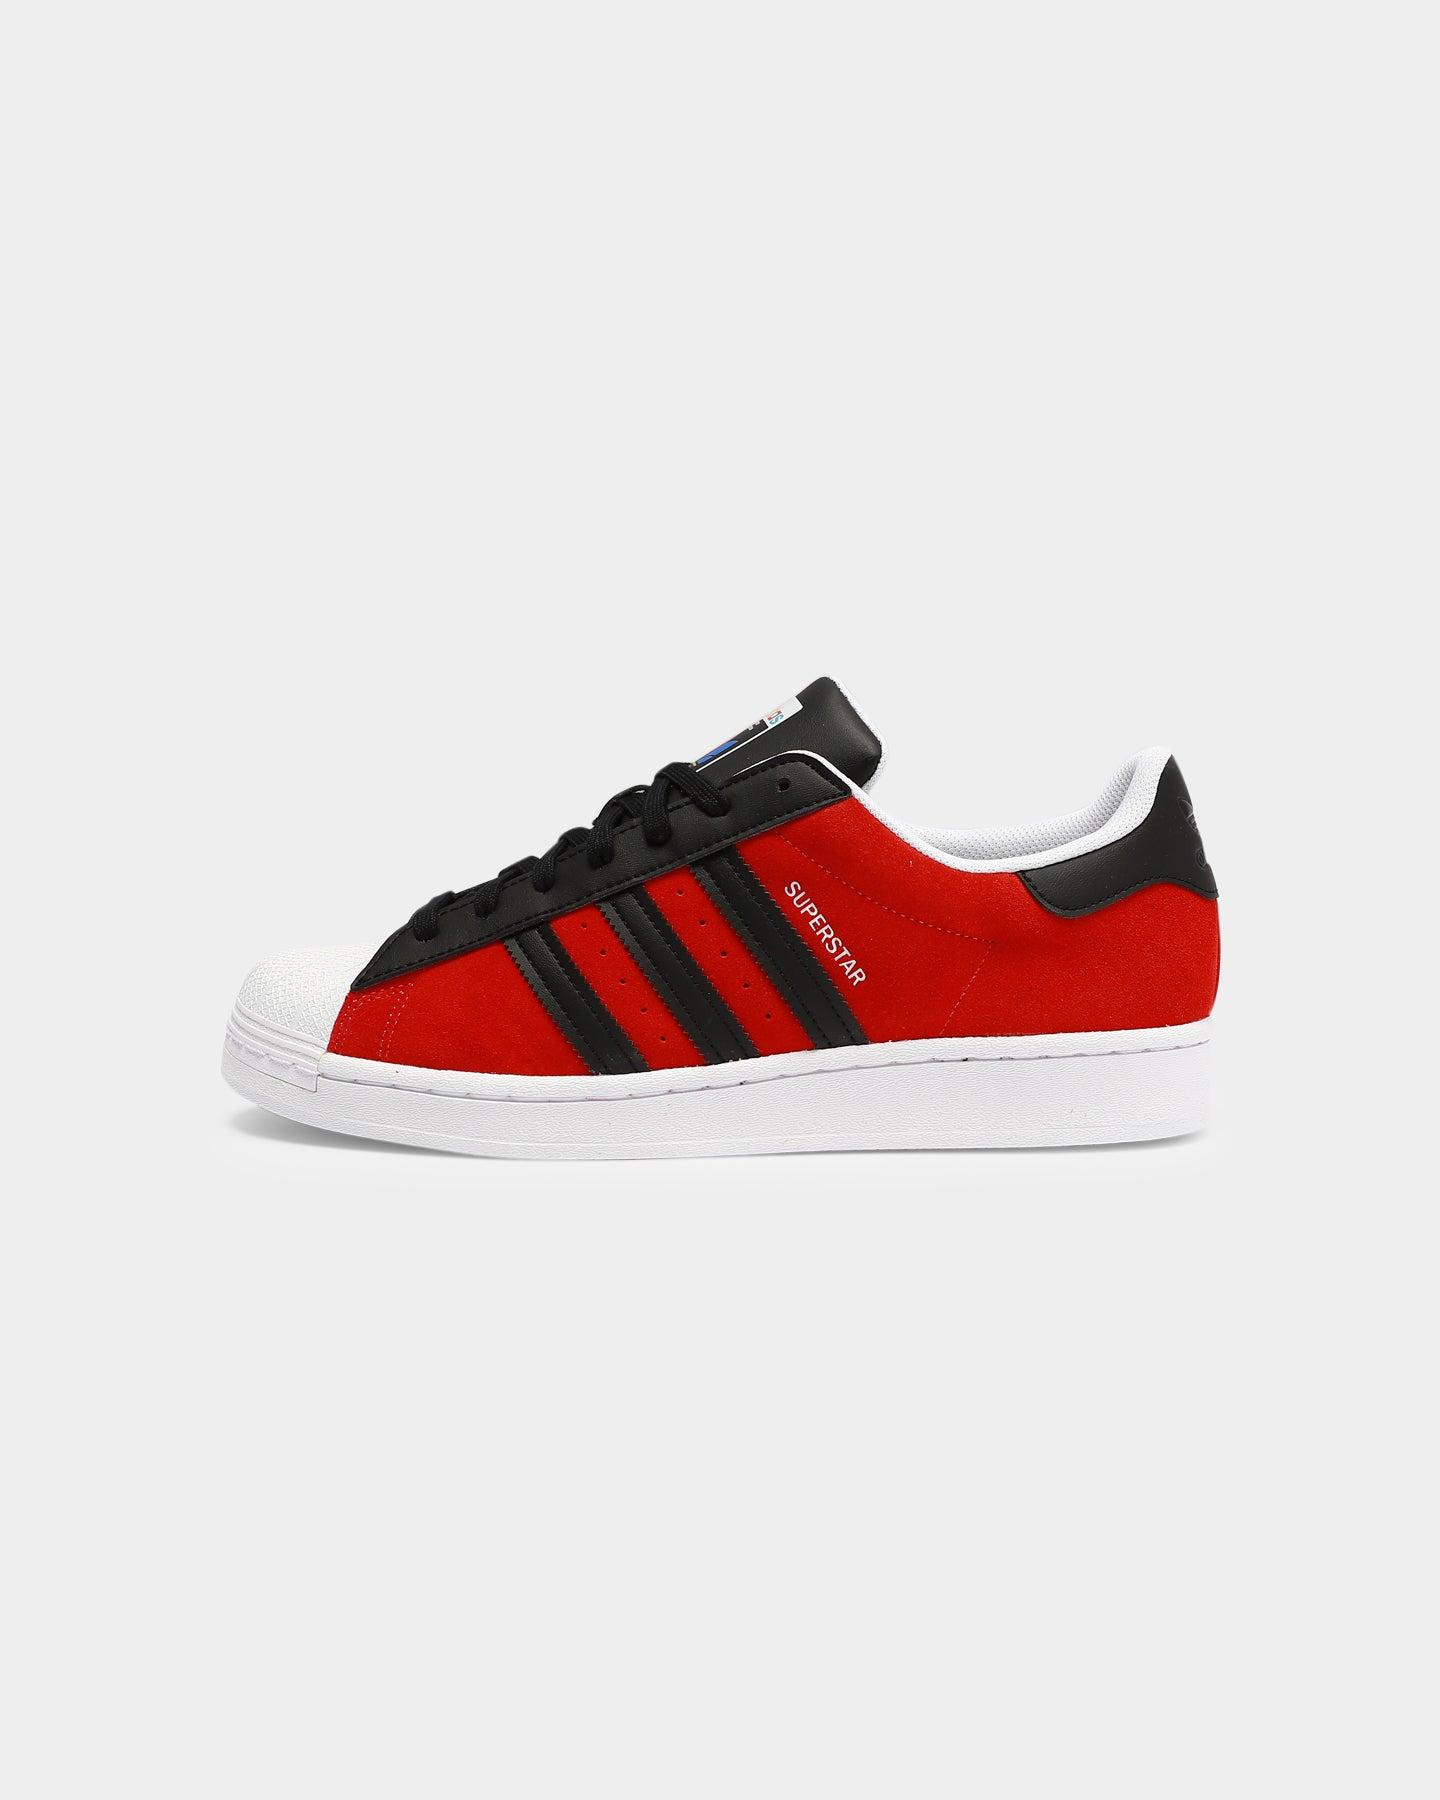 Adidas Superstar Red/Black/Yellow